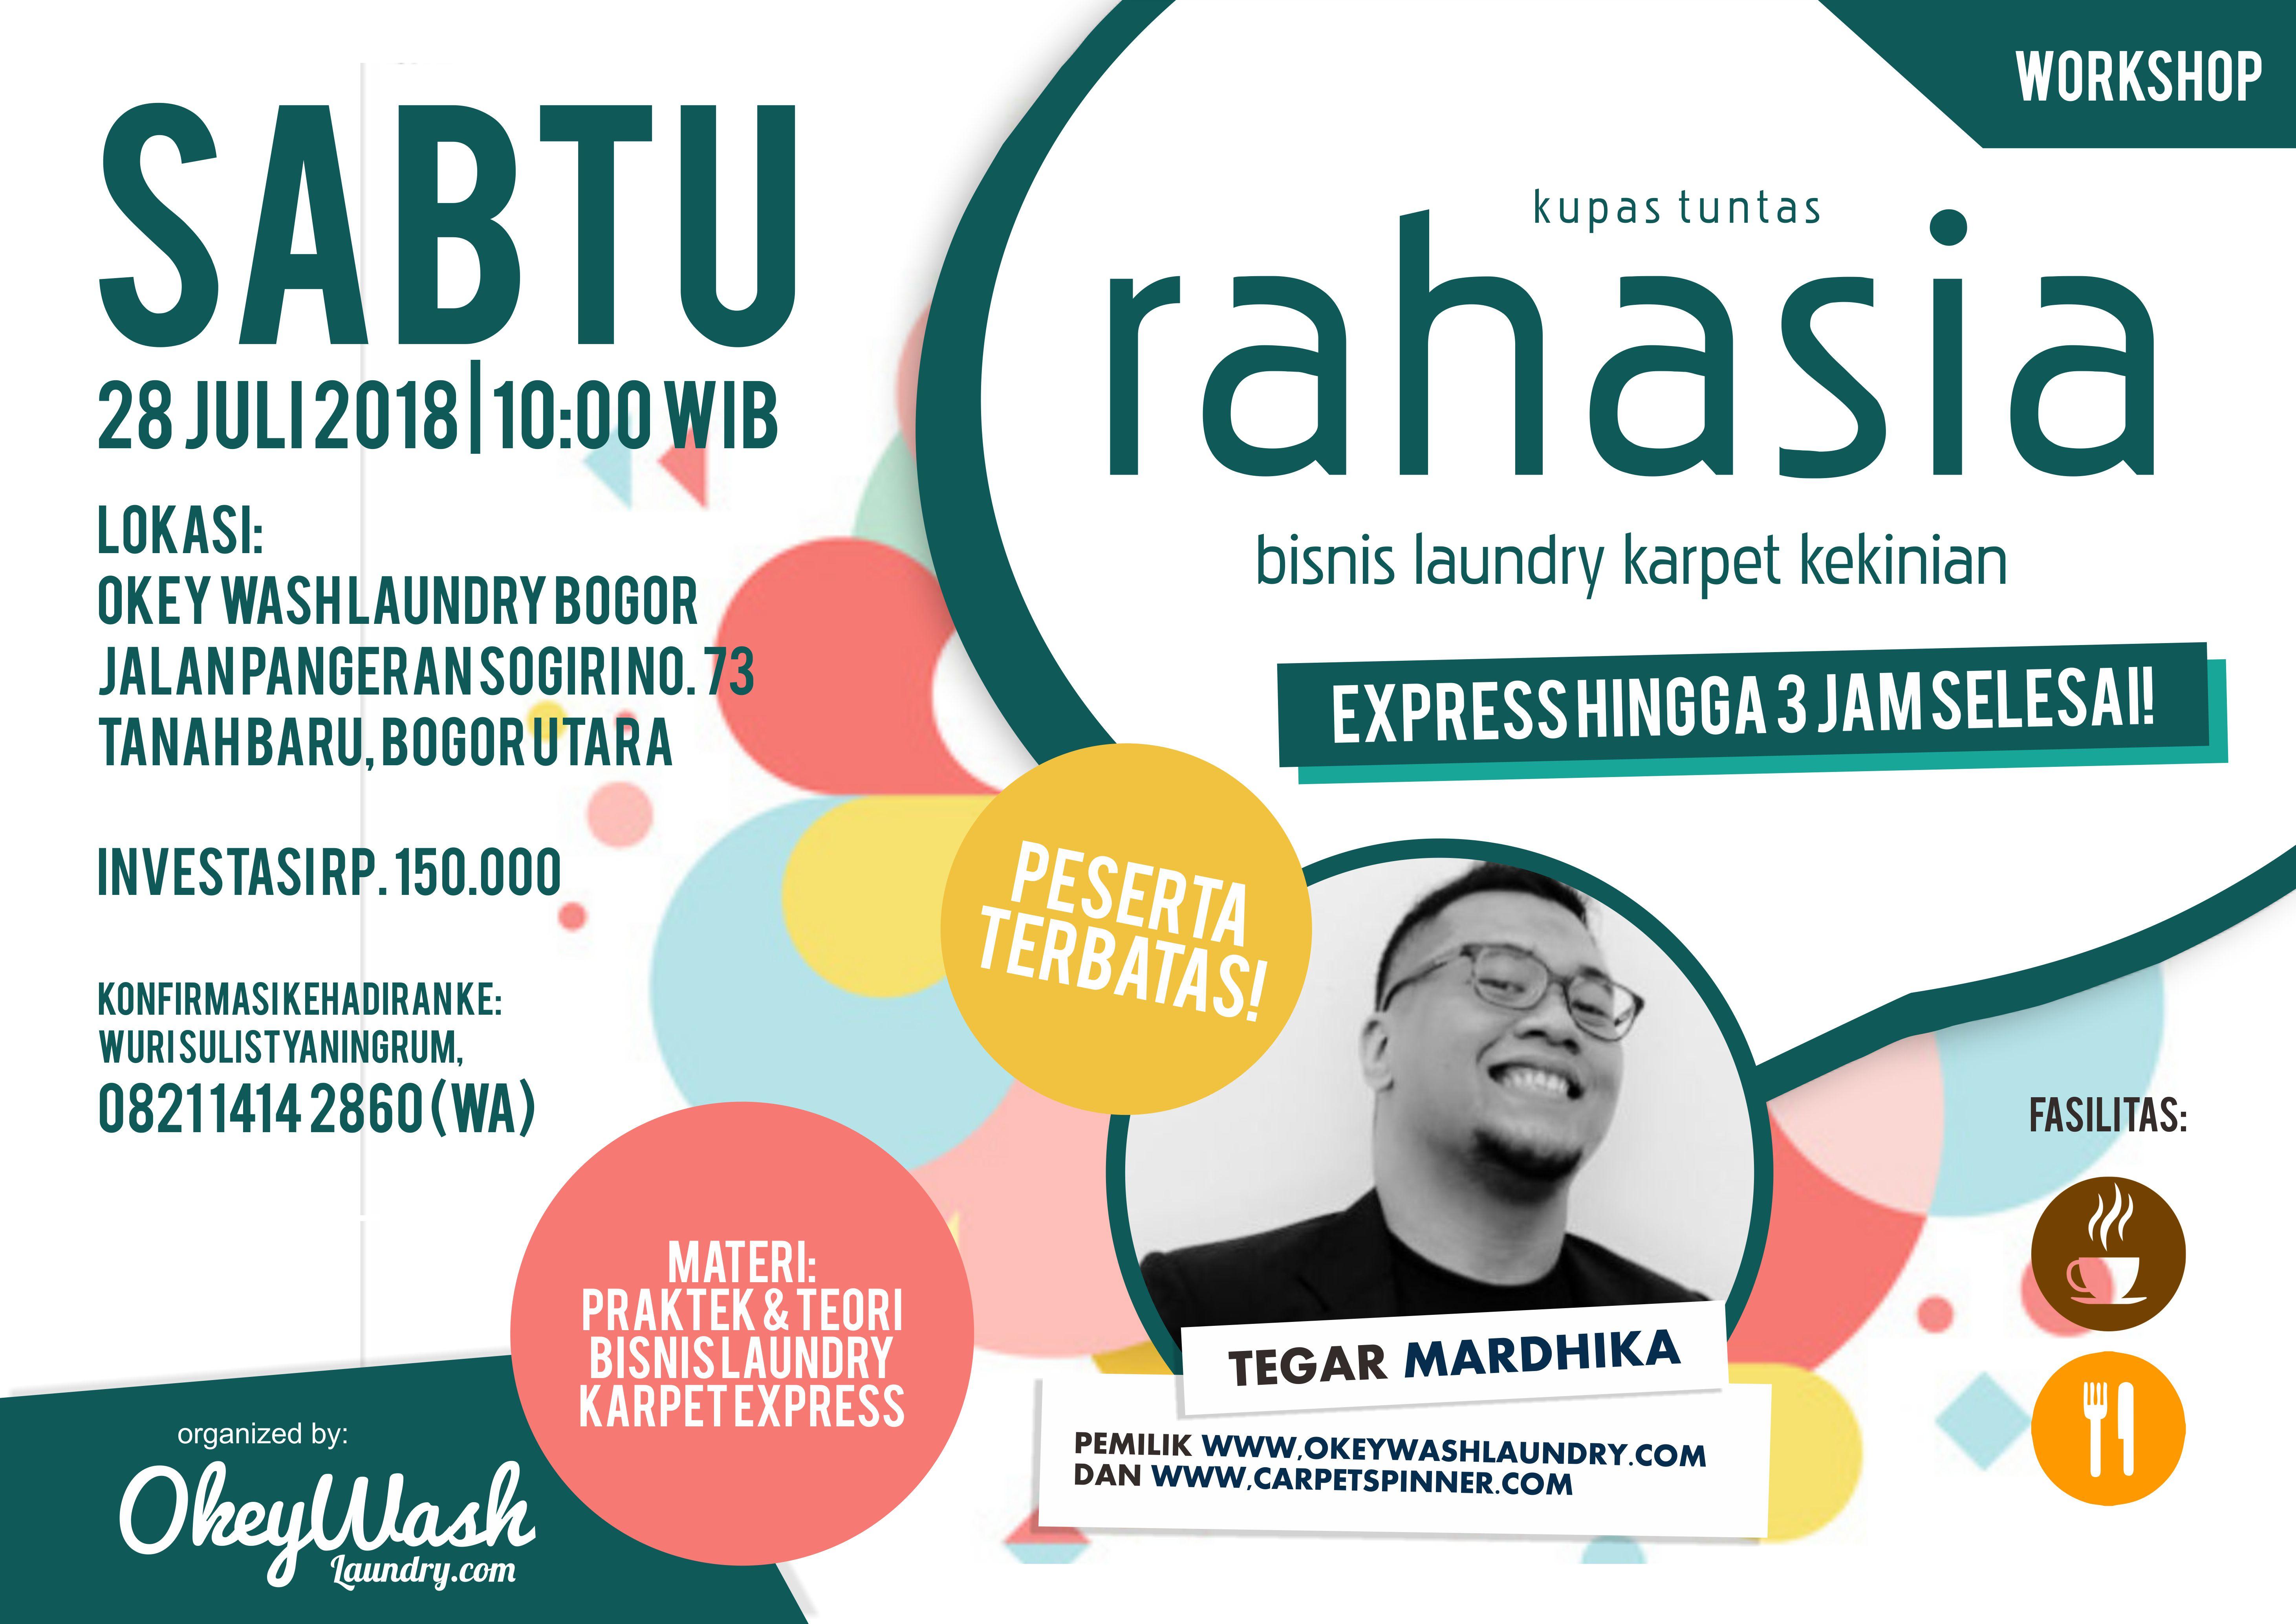 Workshop Kupas Tuntas Rahasia Bisnis Laundry Karpet Kekinian, 28 Juli 2018. Daftar Sekarang!